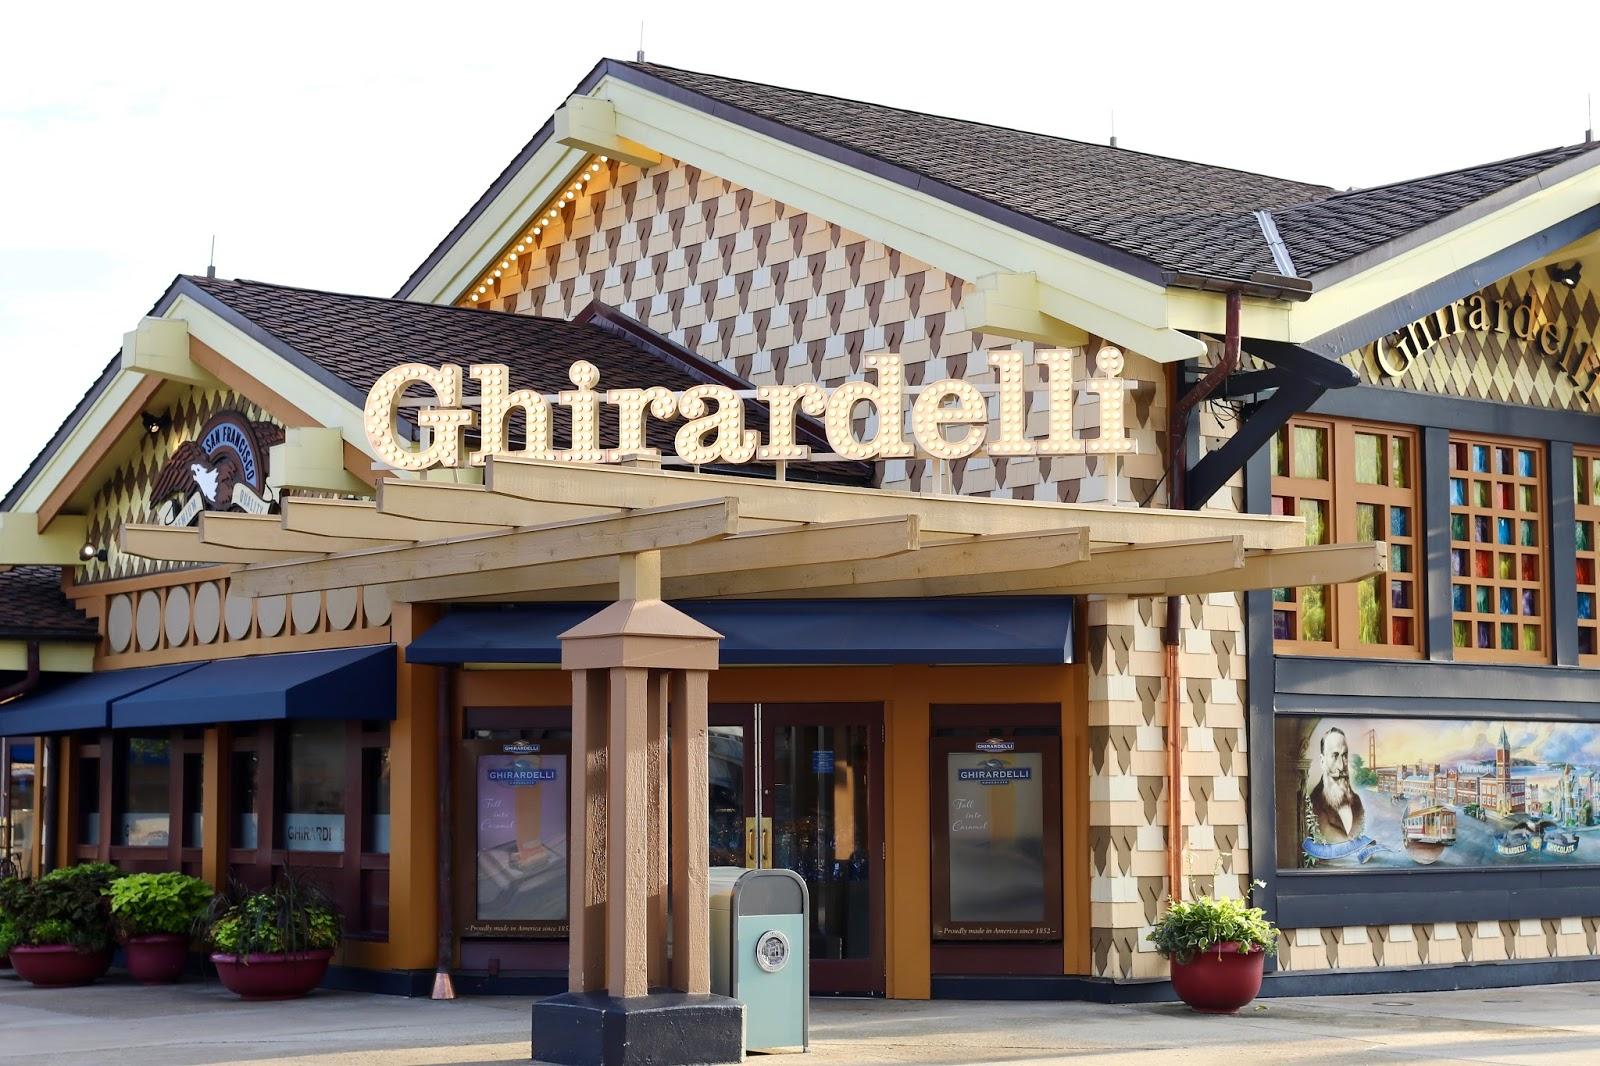 Disney-Springs-Ghirardelli-Ice-Cream-Parlour-Orlando-Florida